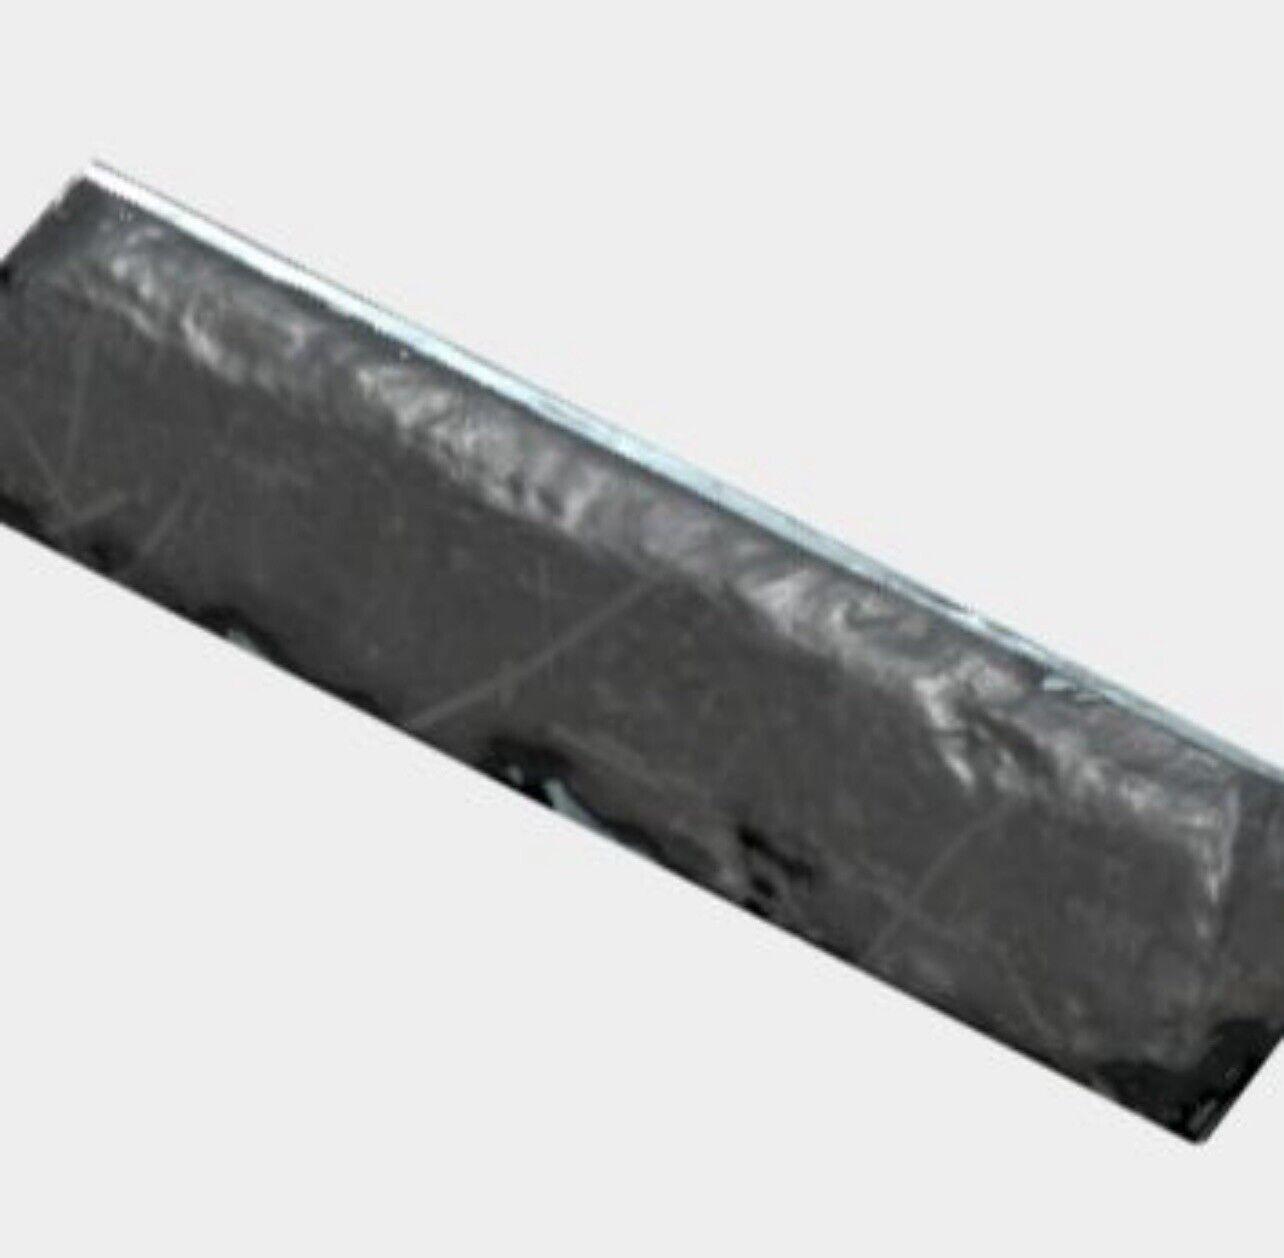 (2,000) steel scrap fallout 76 ps4